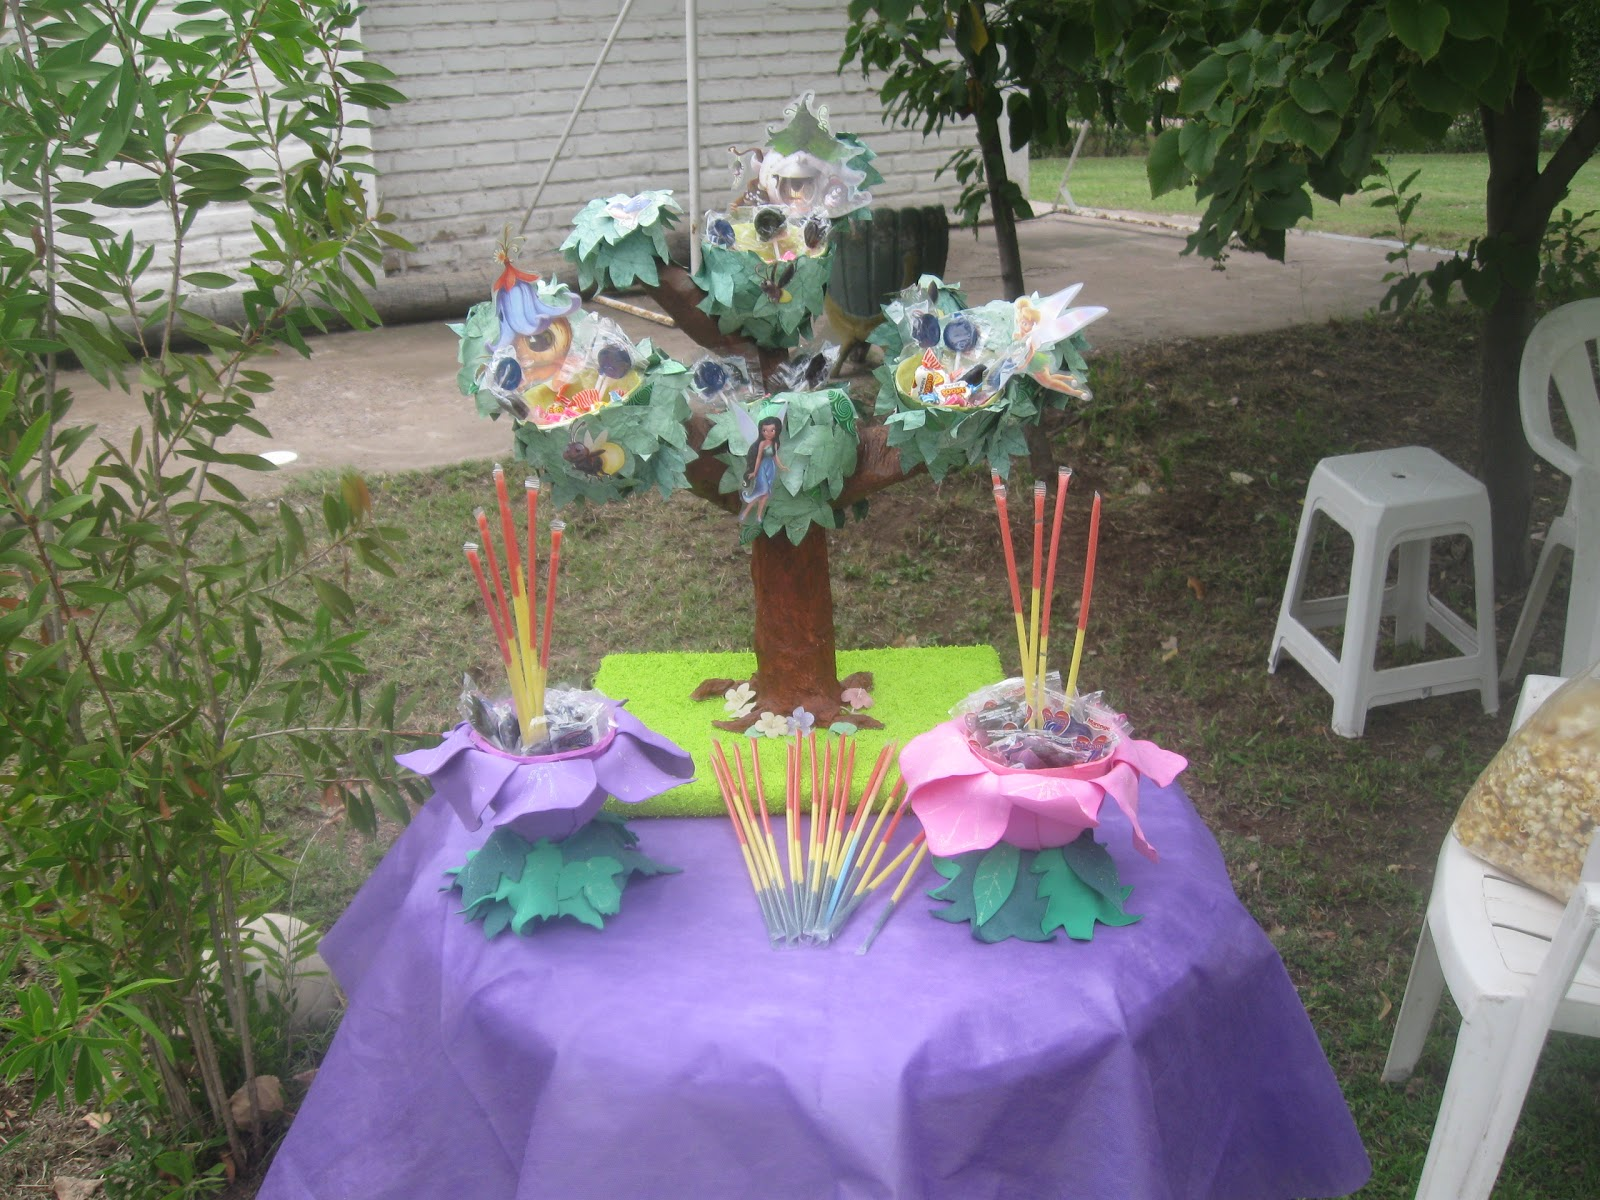 Decoraciones m gicas cumplea os tinkerbell for Decoracion de cumpleanos